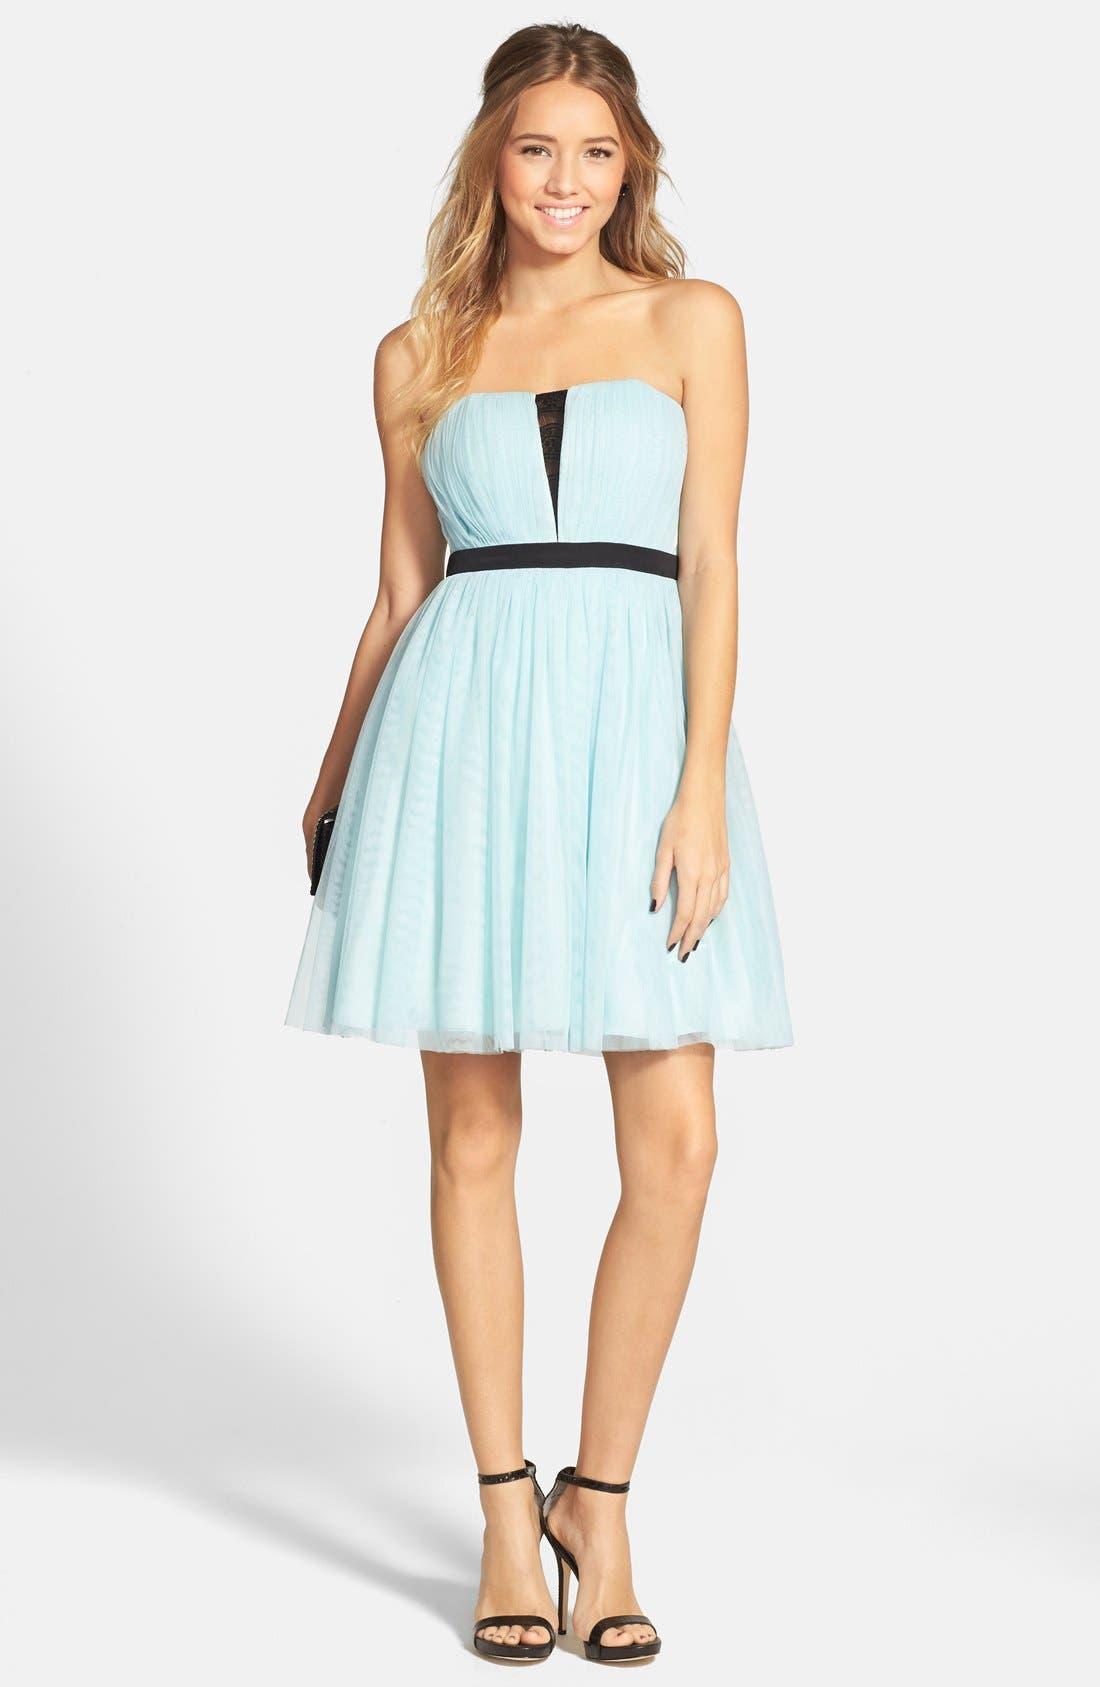 Alternate Image 1 Selected - a. drea Lace Inset Strapless Ballerina Dress (Juniors)